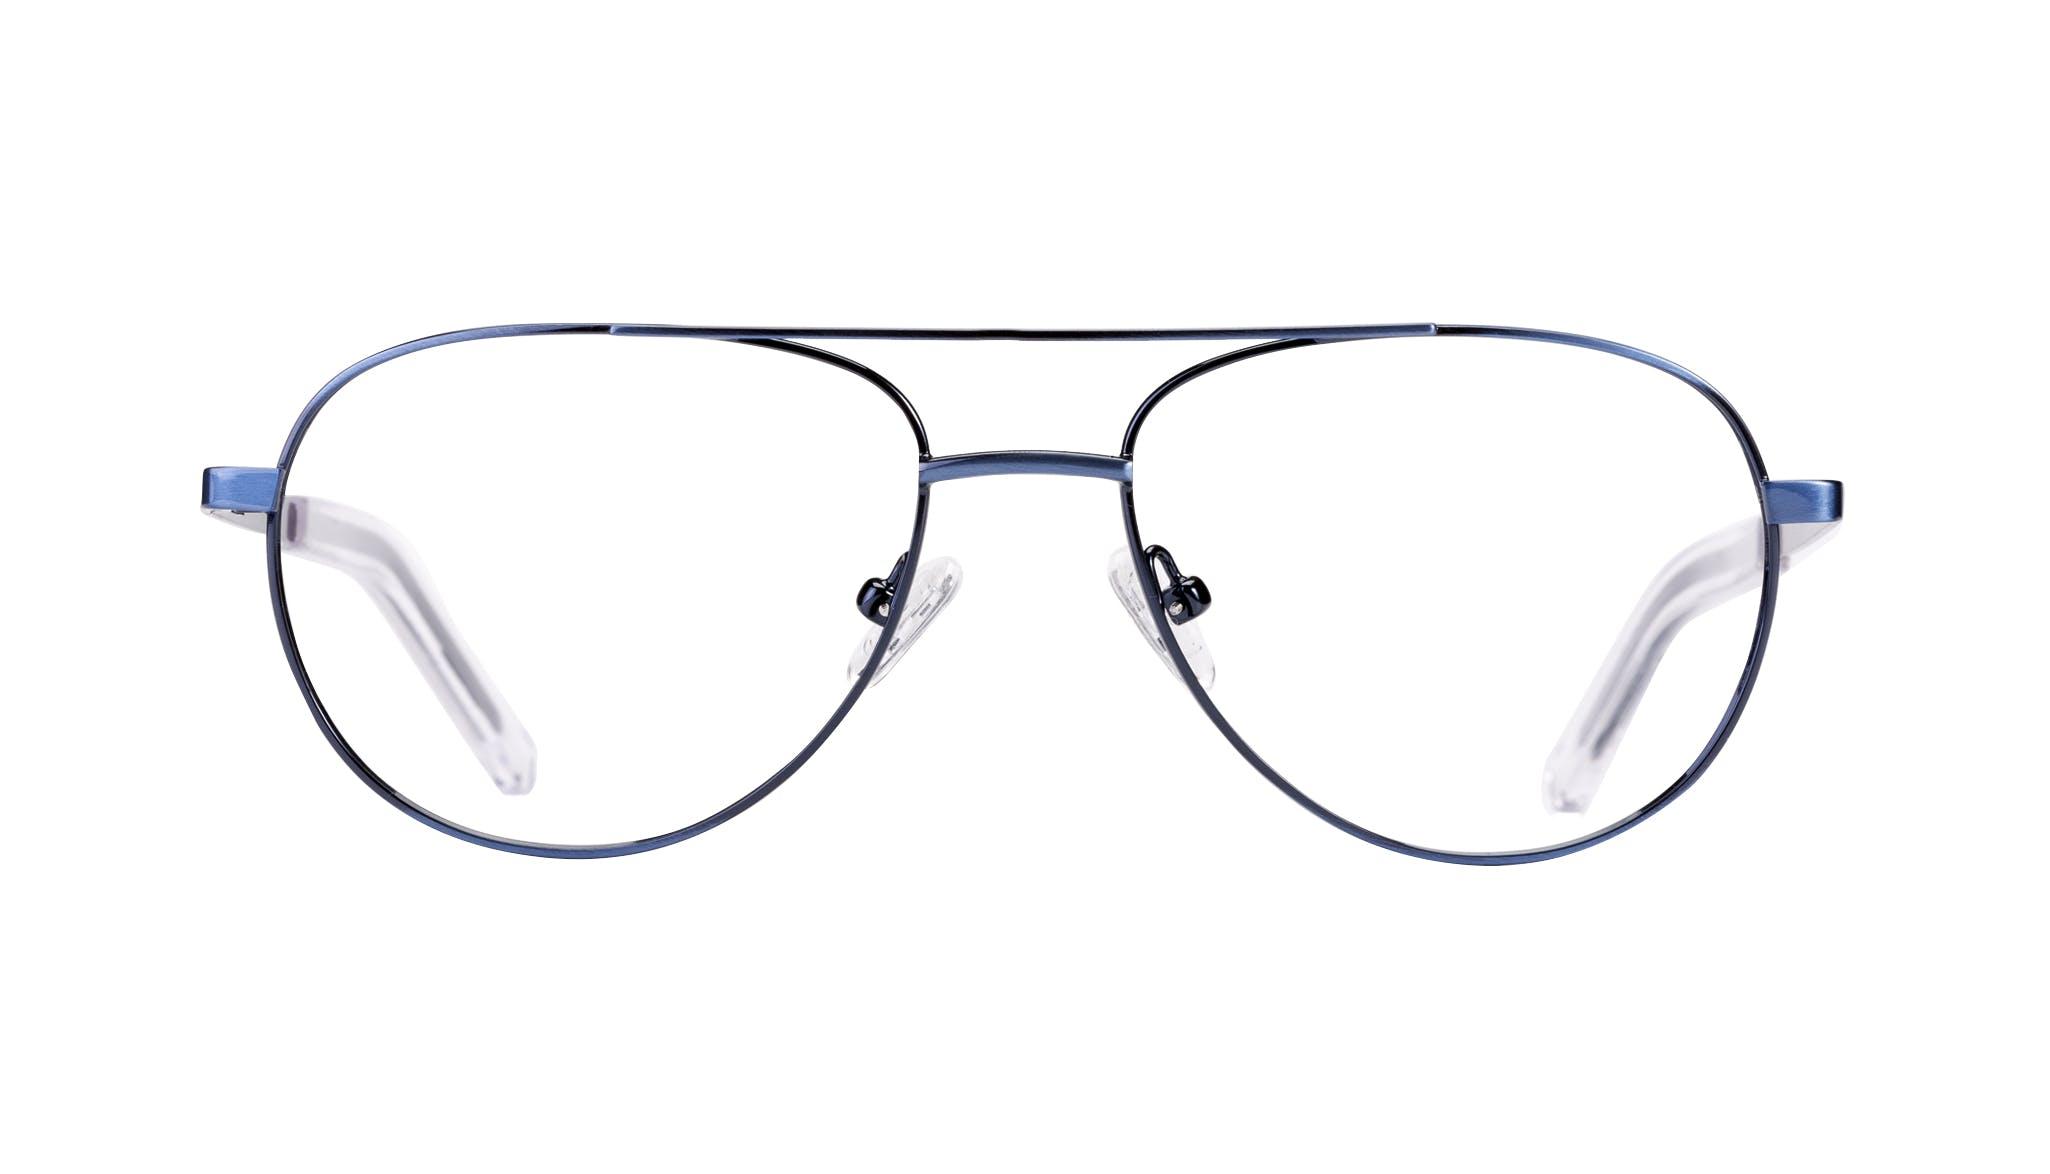 Affordable Fashion Glasses Aviator Eyeglasses Men Devoted Midnight Front